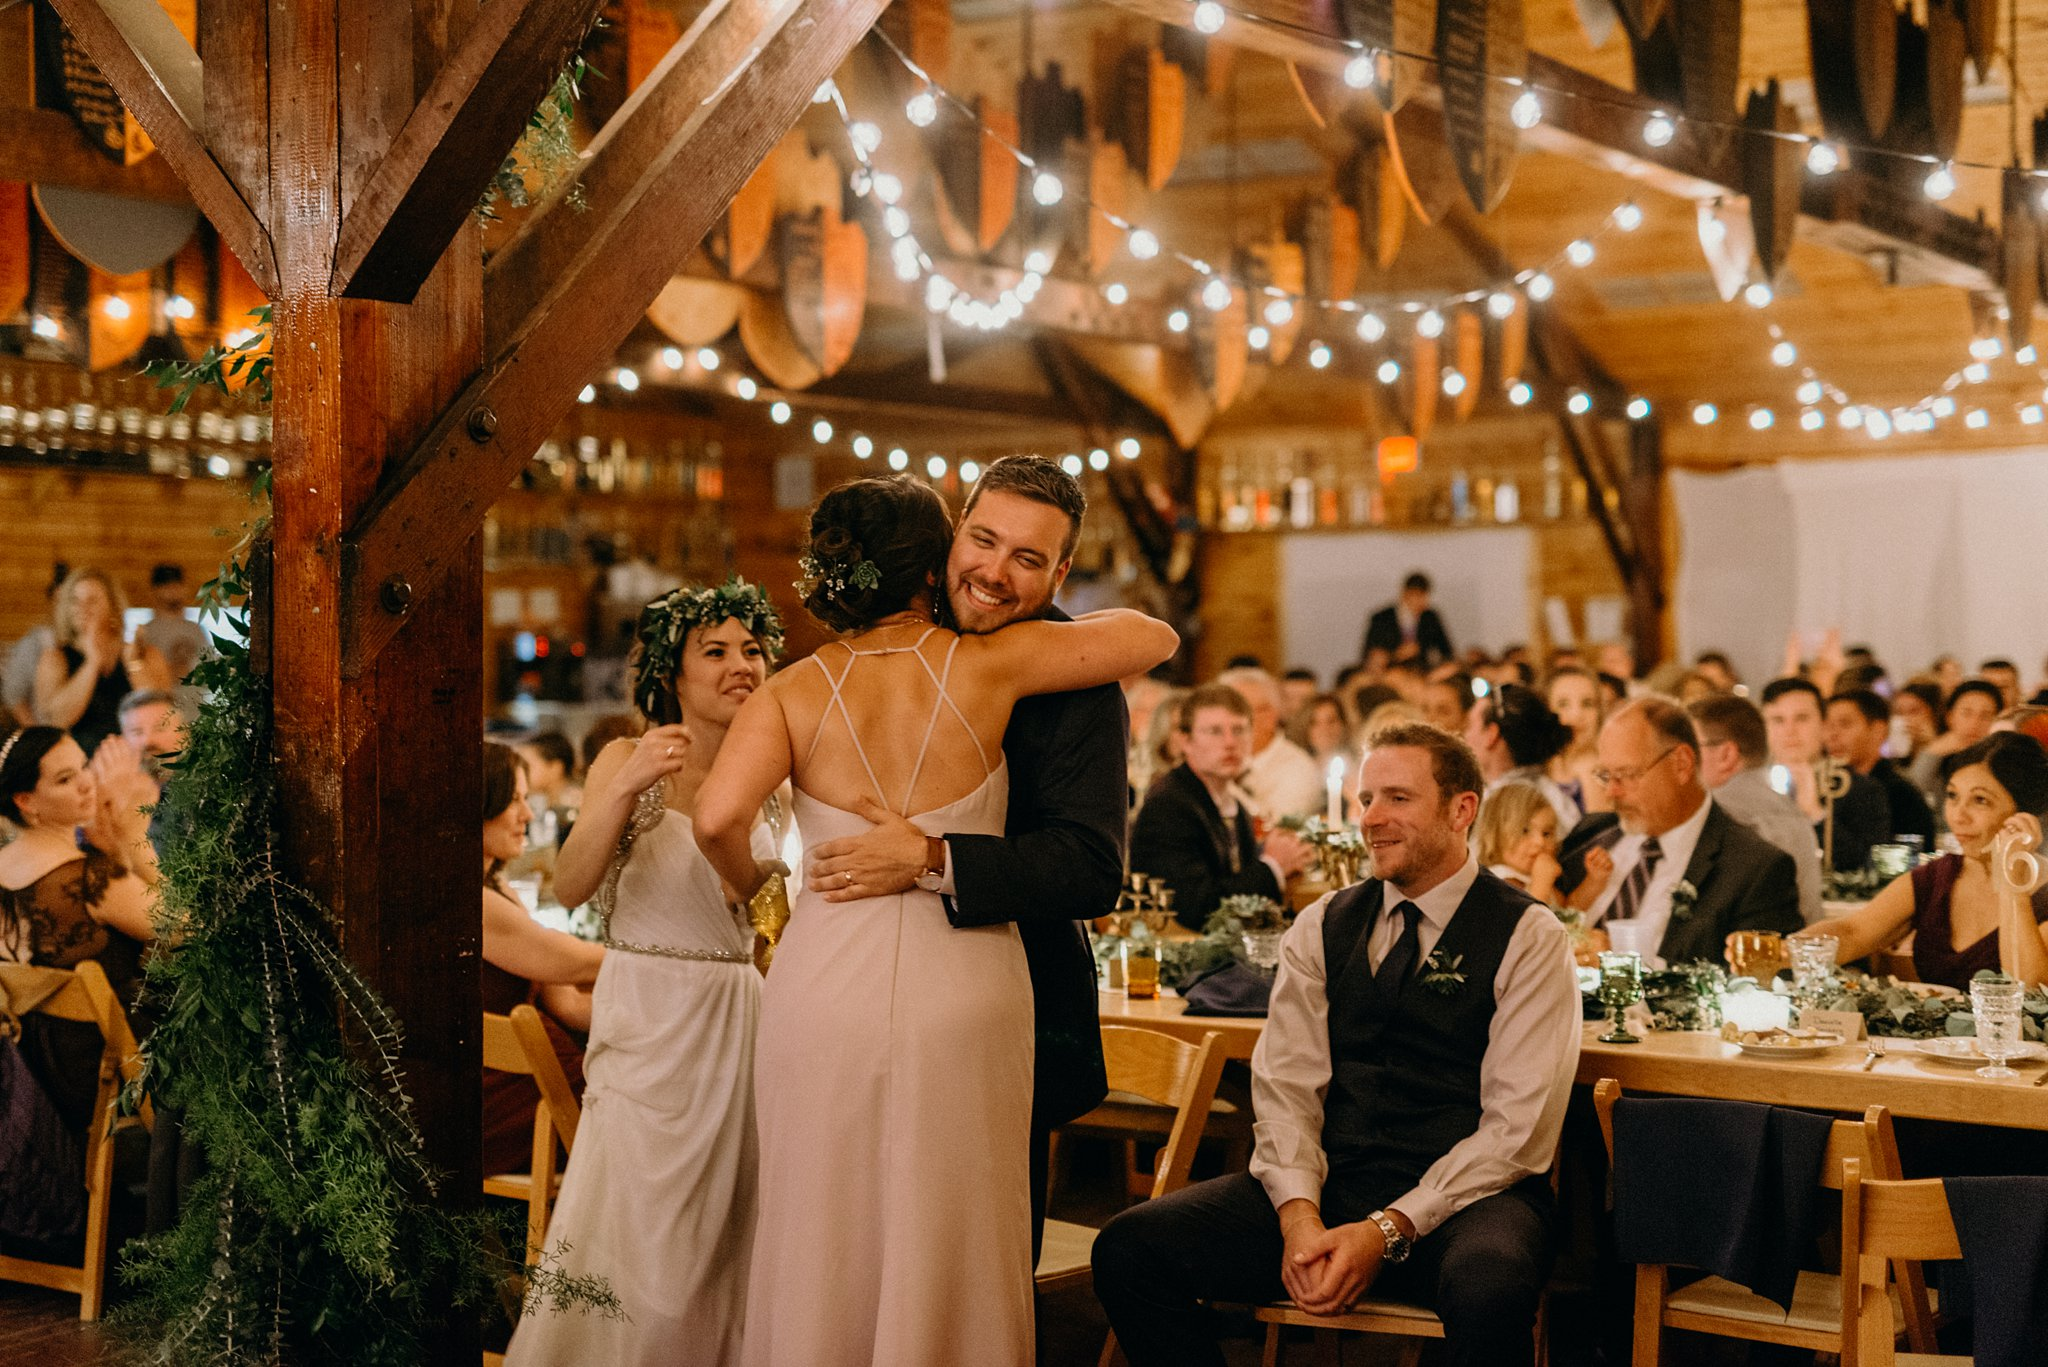 kaihla_tonai_intimate_wedding_elopement_photographer_6683.jpg